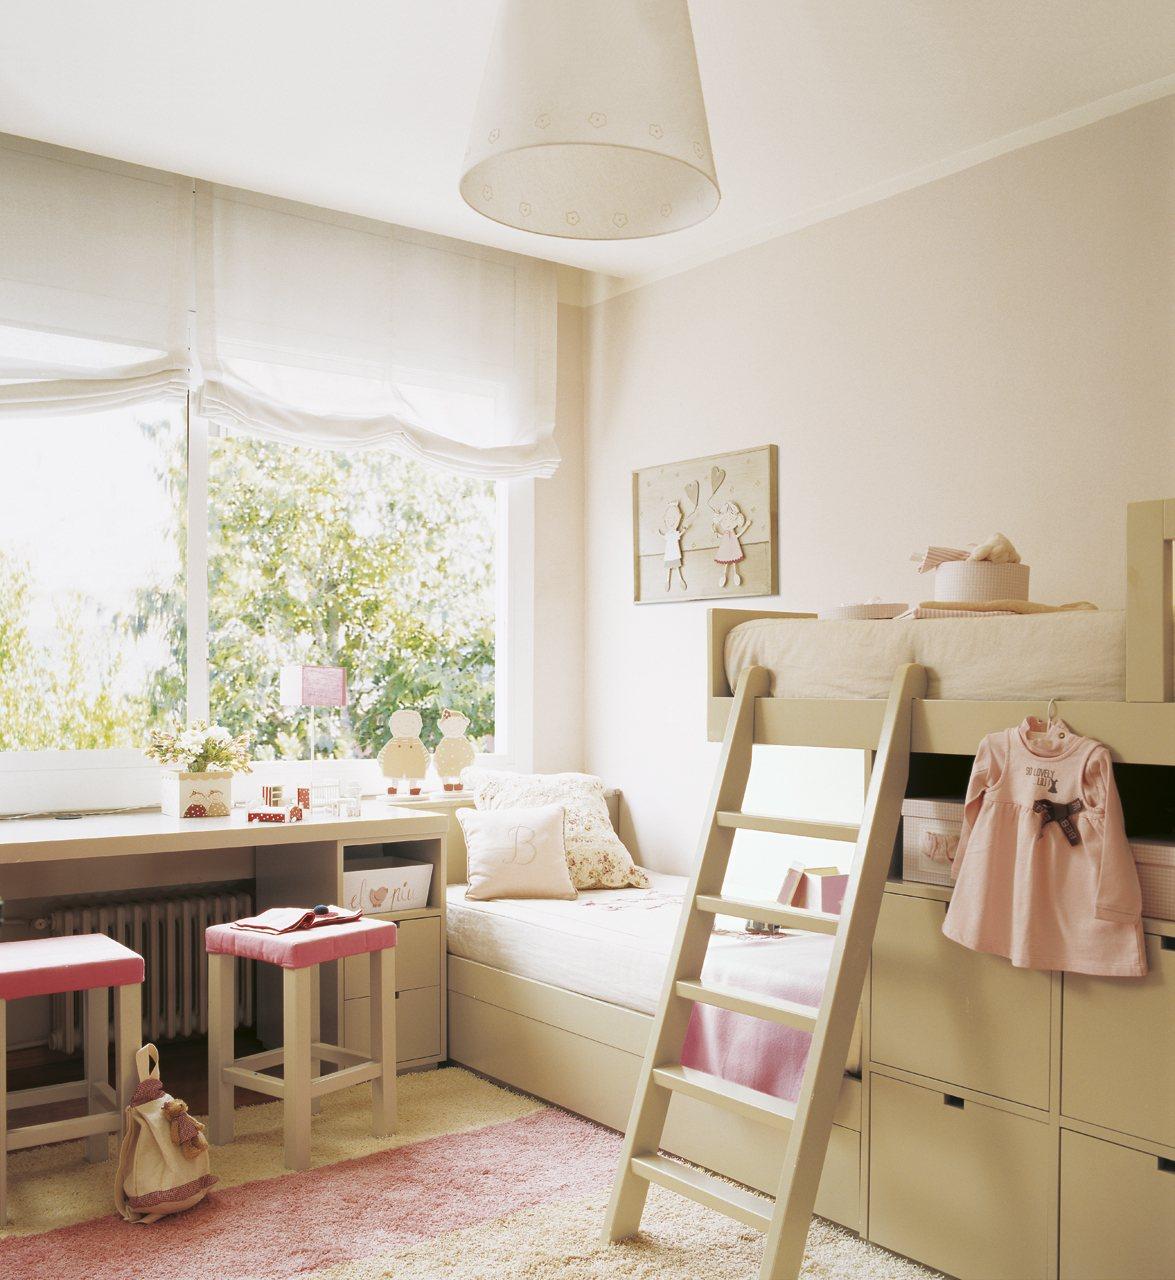 Dormitorios infantiles peque os s cales partido for Dormitorio para 4 ninos